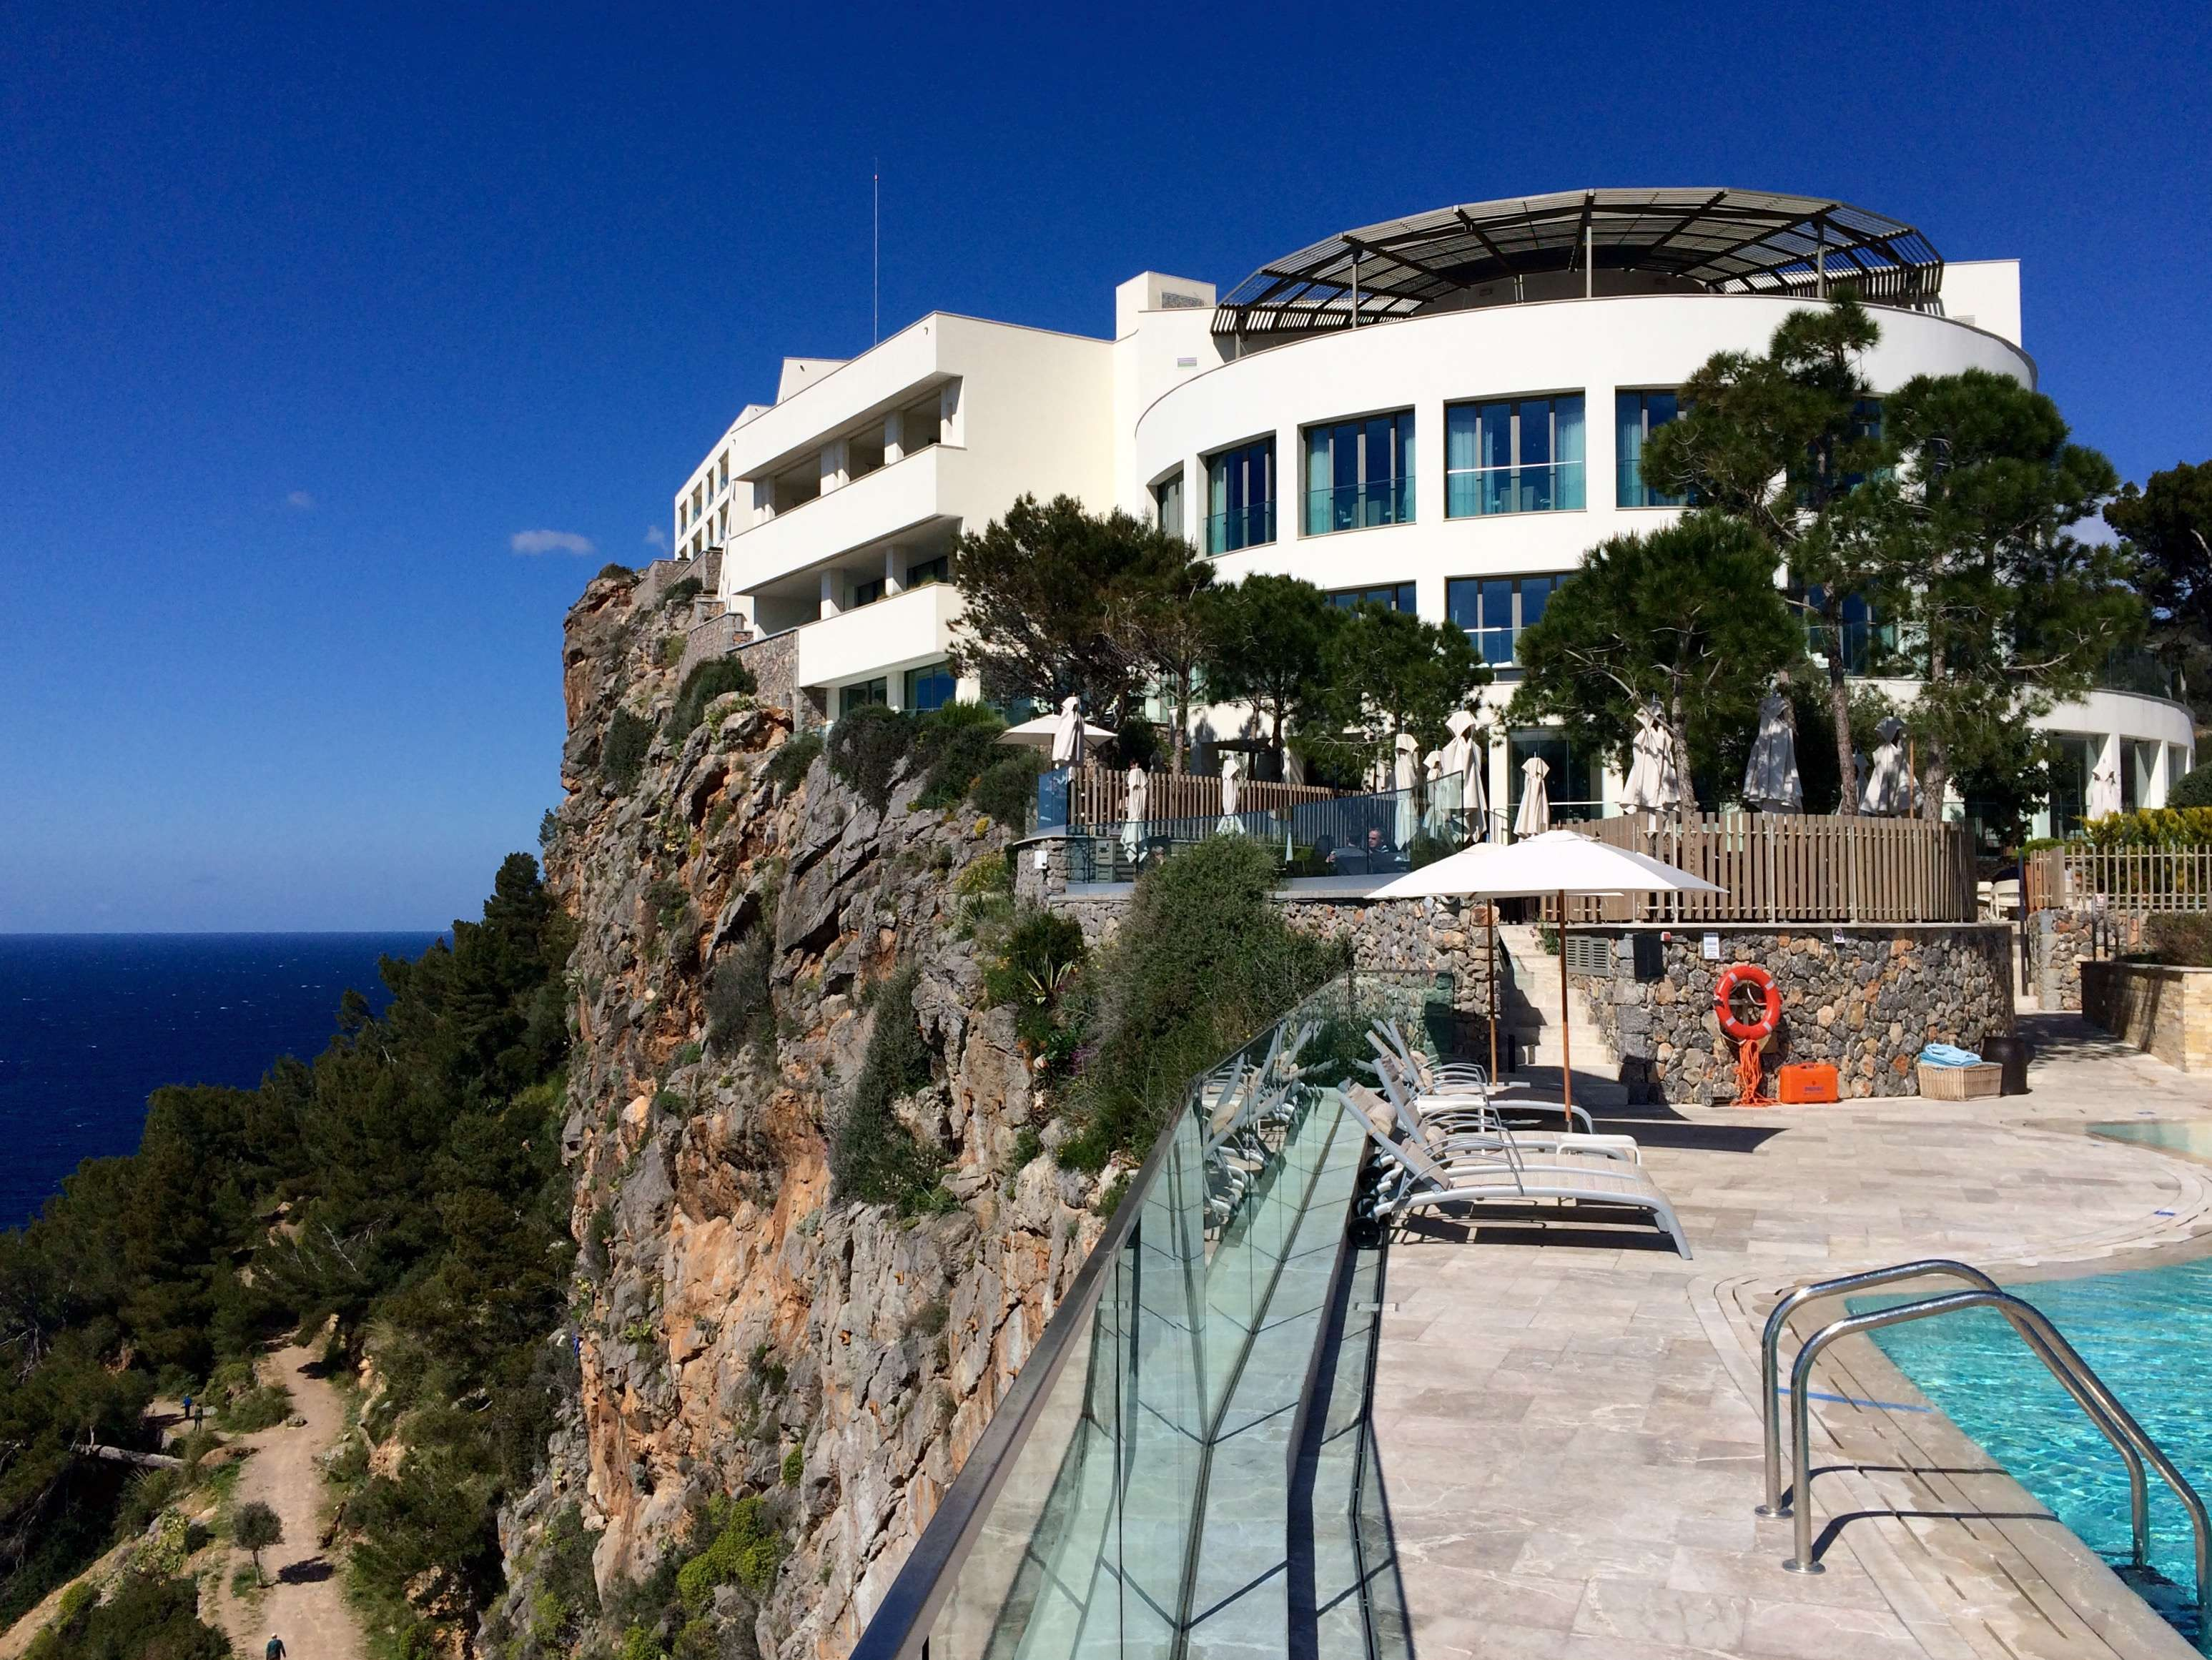 Mein perfektes Mallorca Wochenende staedtereisen sonne land und leute mallorca familie europa  tui berlin mallorca jumeirah soller port de soller